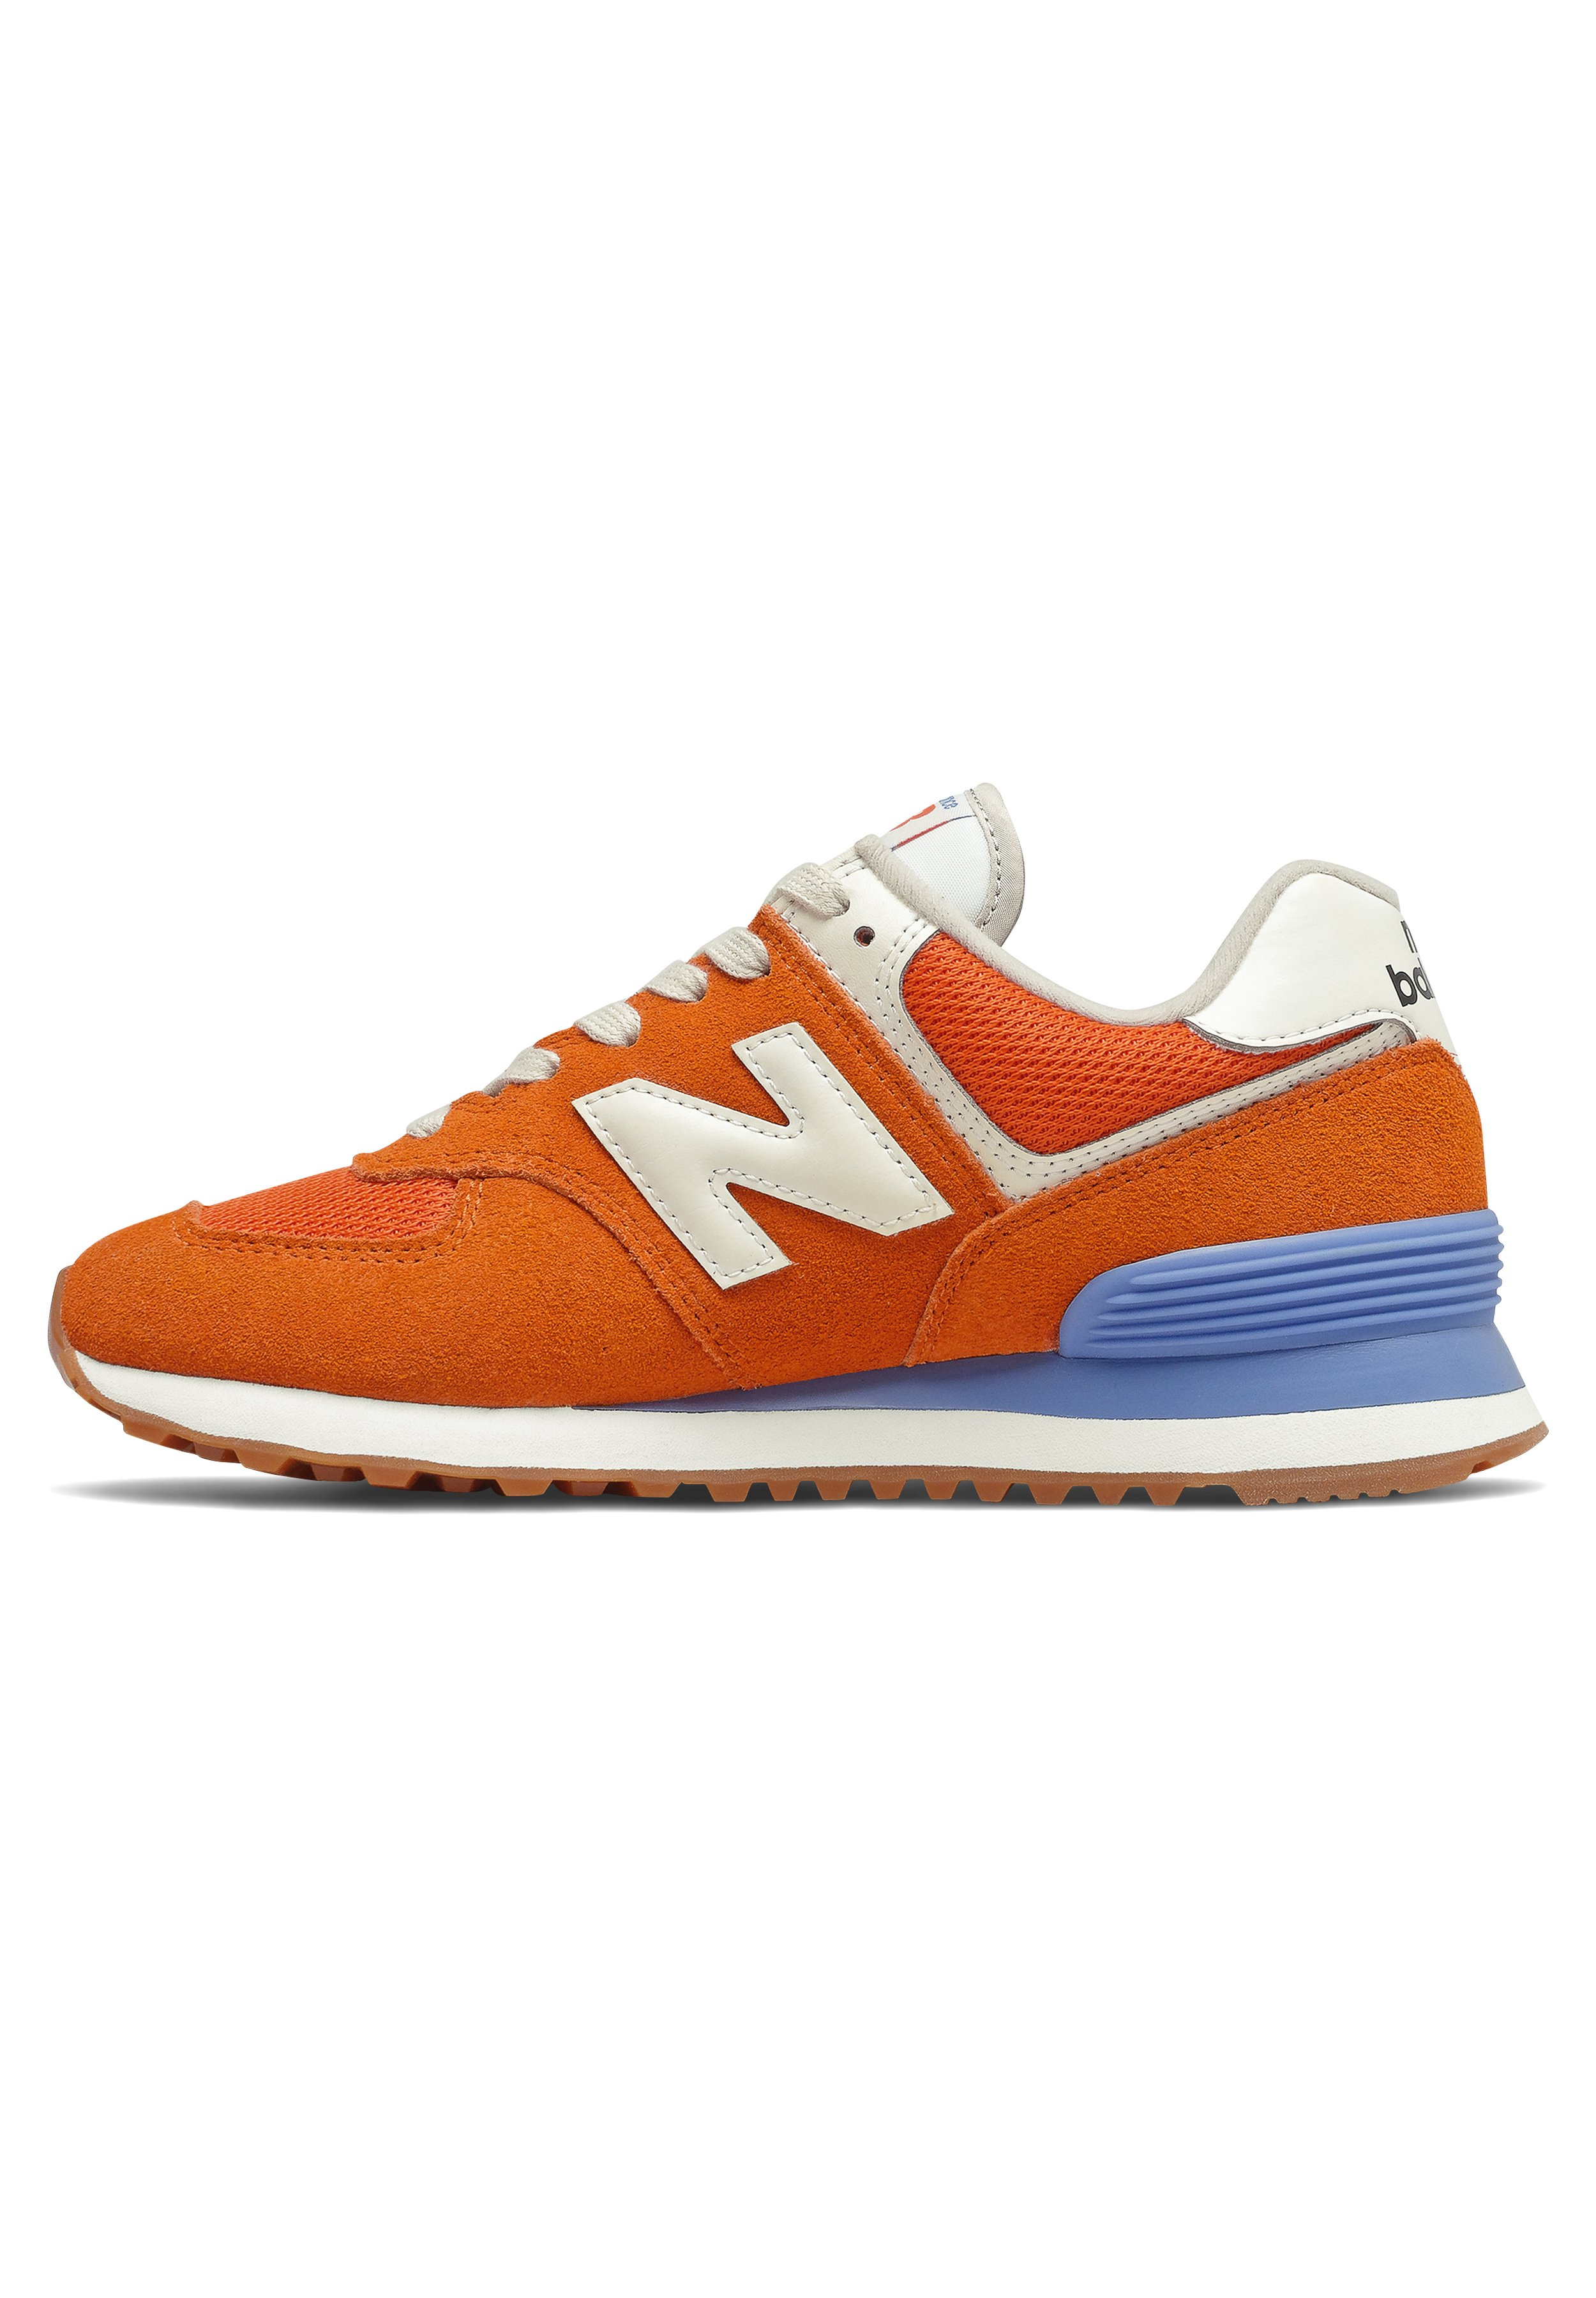 New Balance Baskets basses - varsity orange/orange - ZALANDO.FR